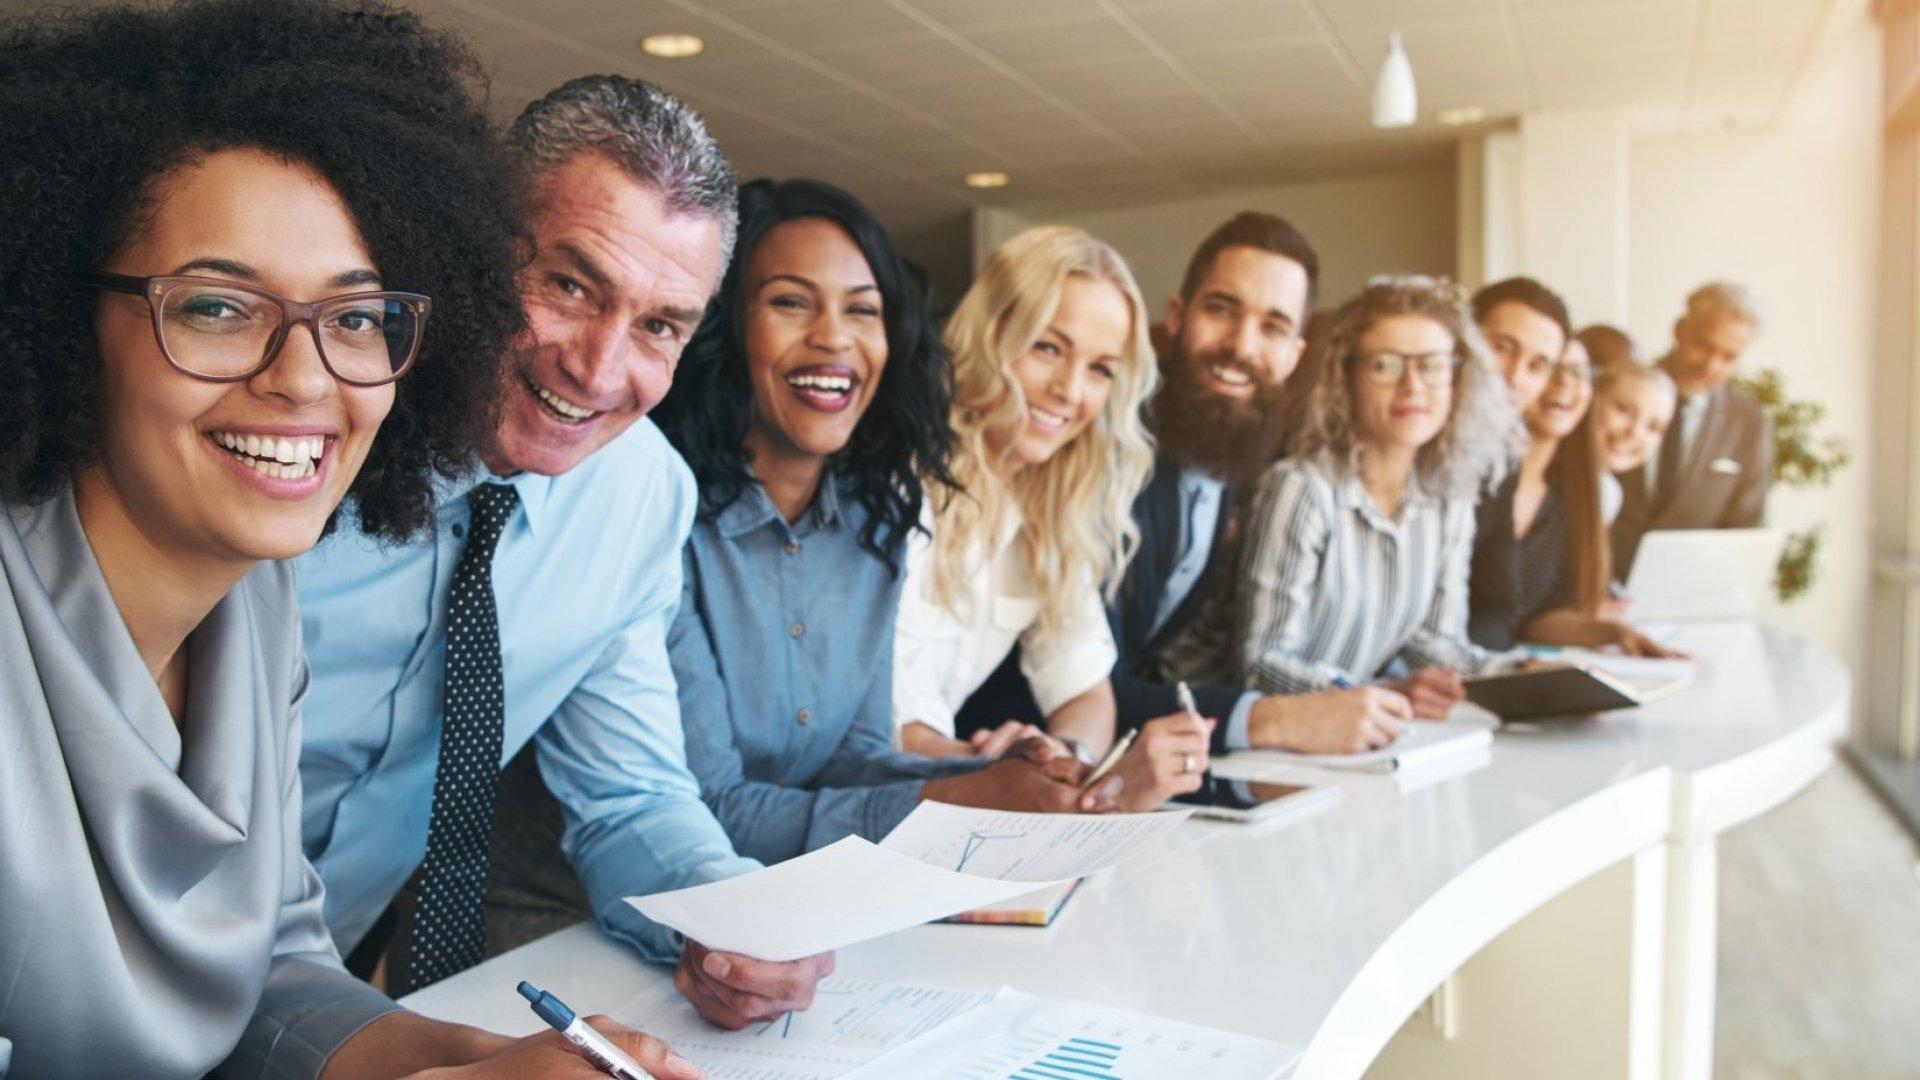 10 Interpersonal Skills that Set Professionals Apart